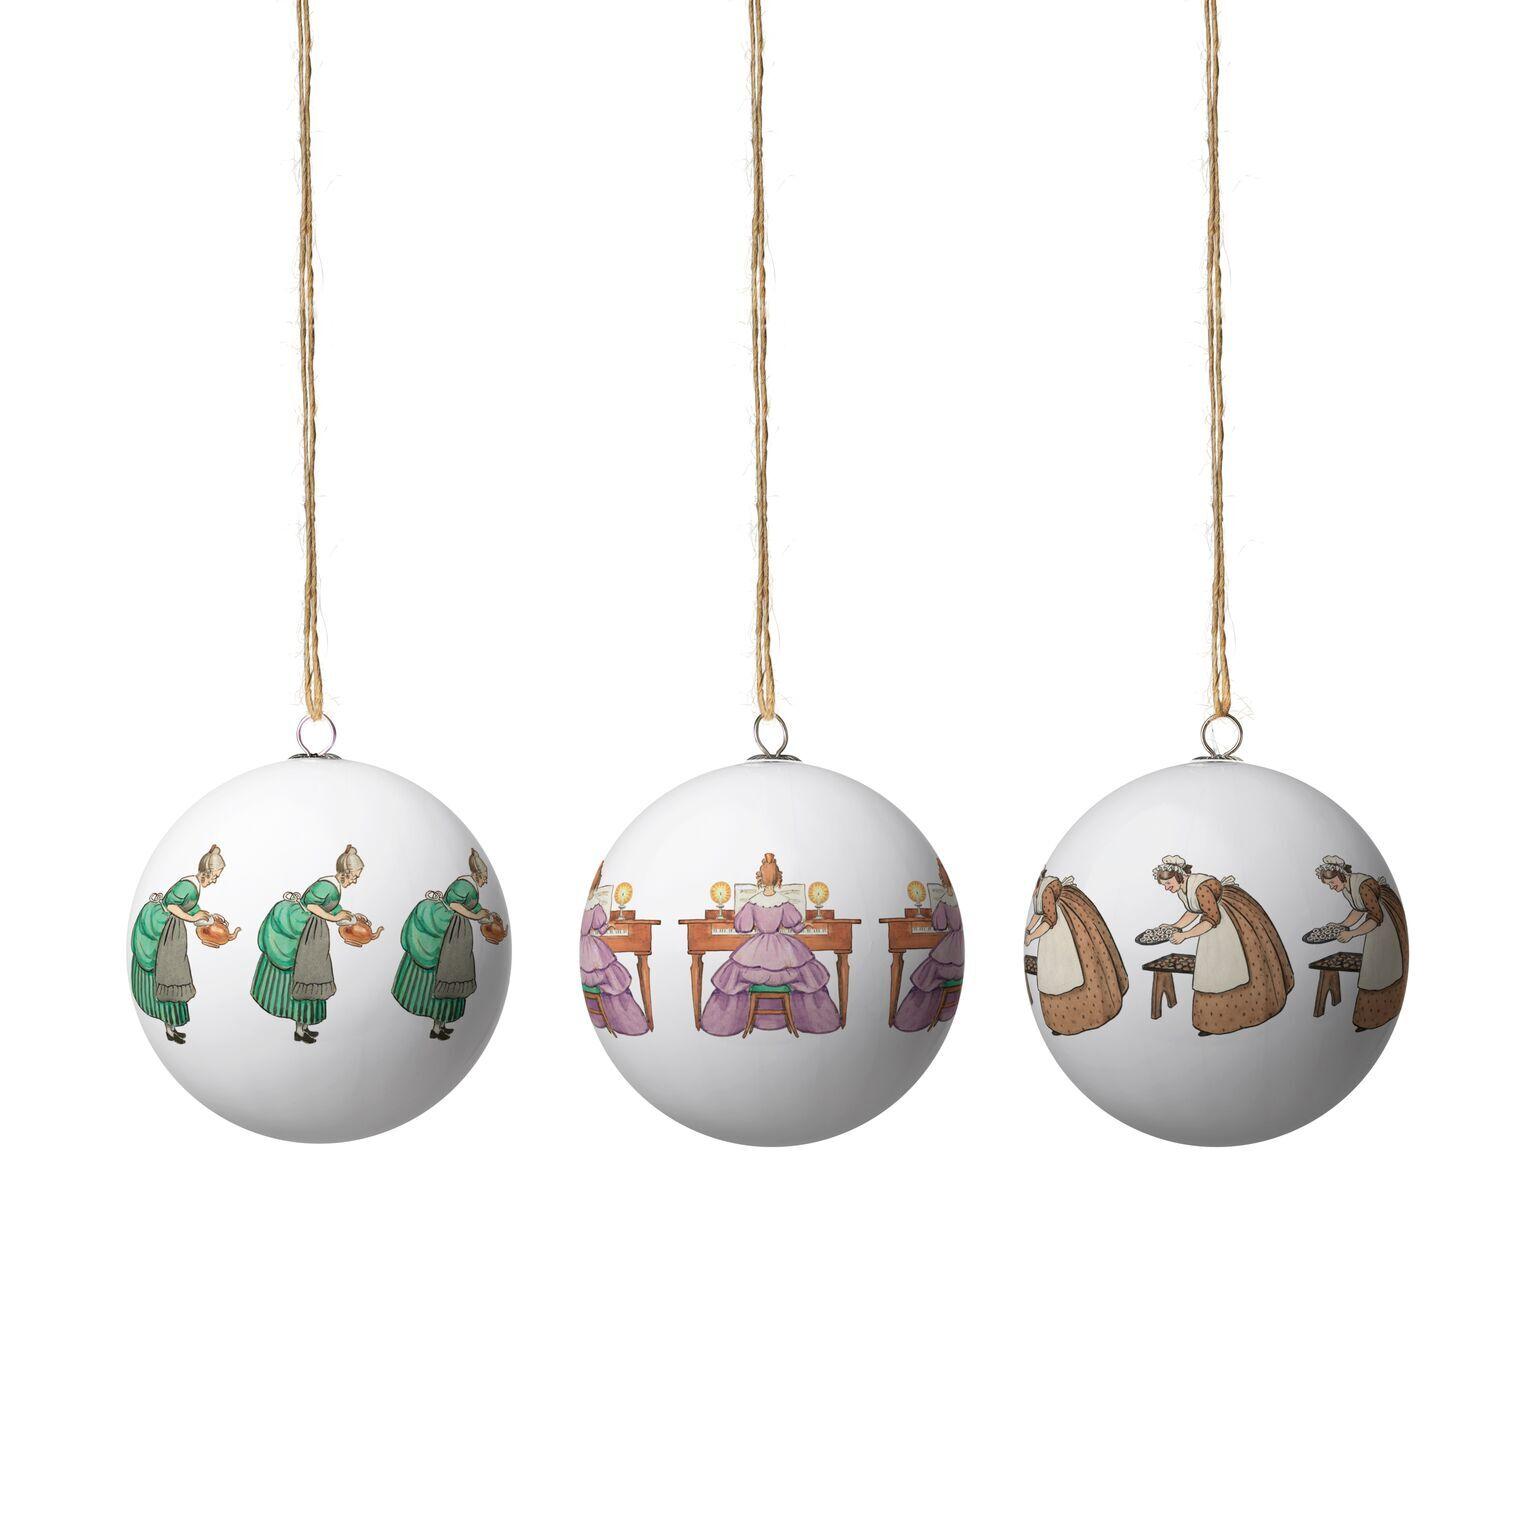 Design House Elsa Beskow Christmas Tree Ornaments, Aunts